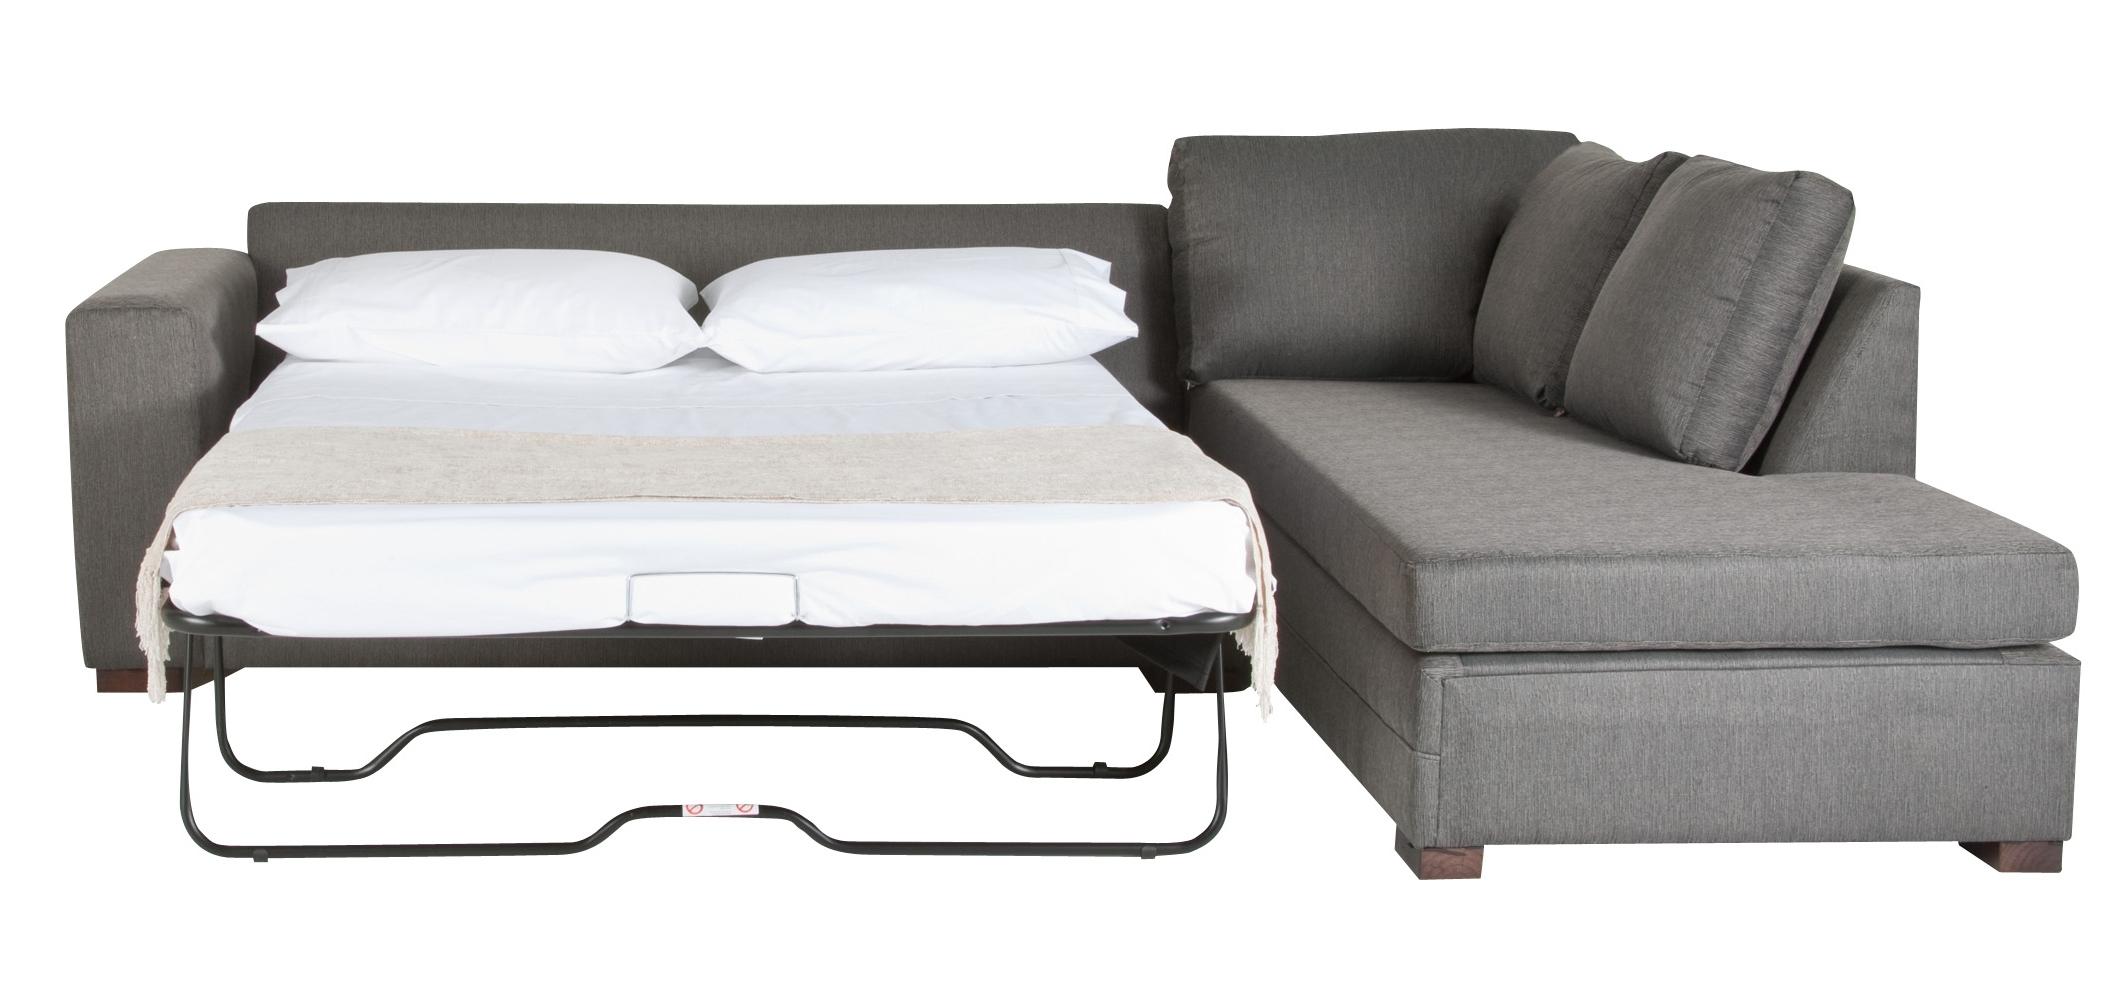 Ikea Sleeper Sofa (View 12 of 20)